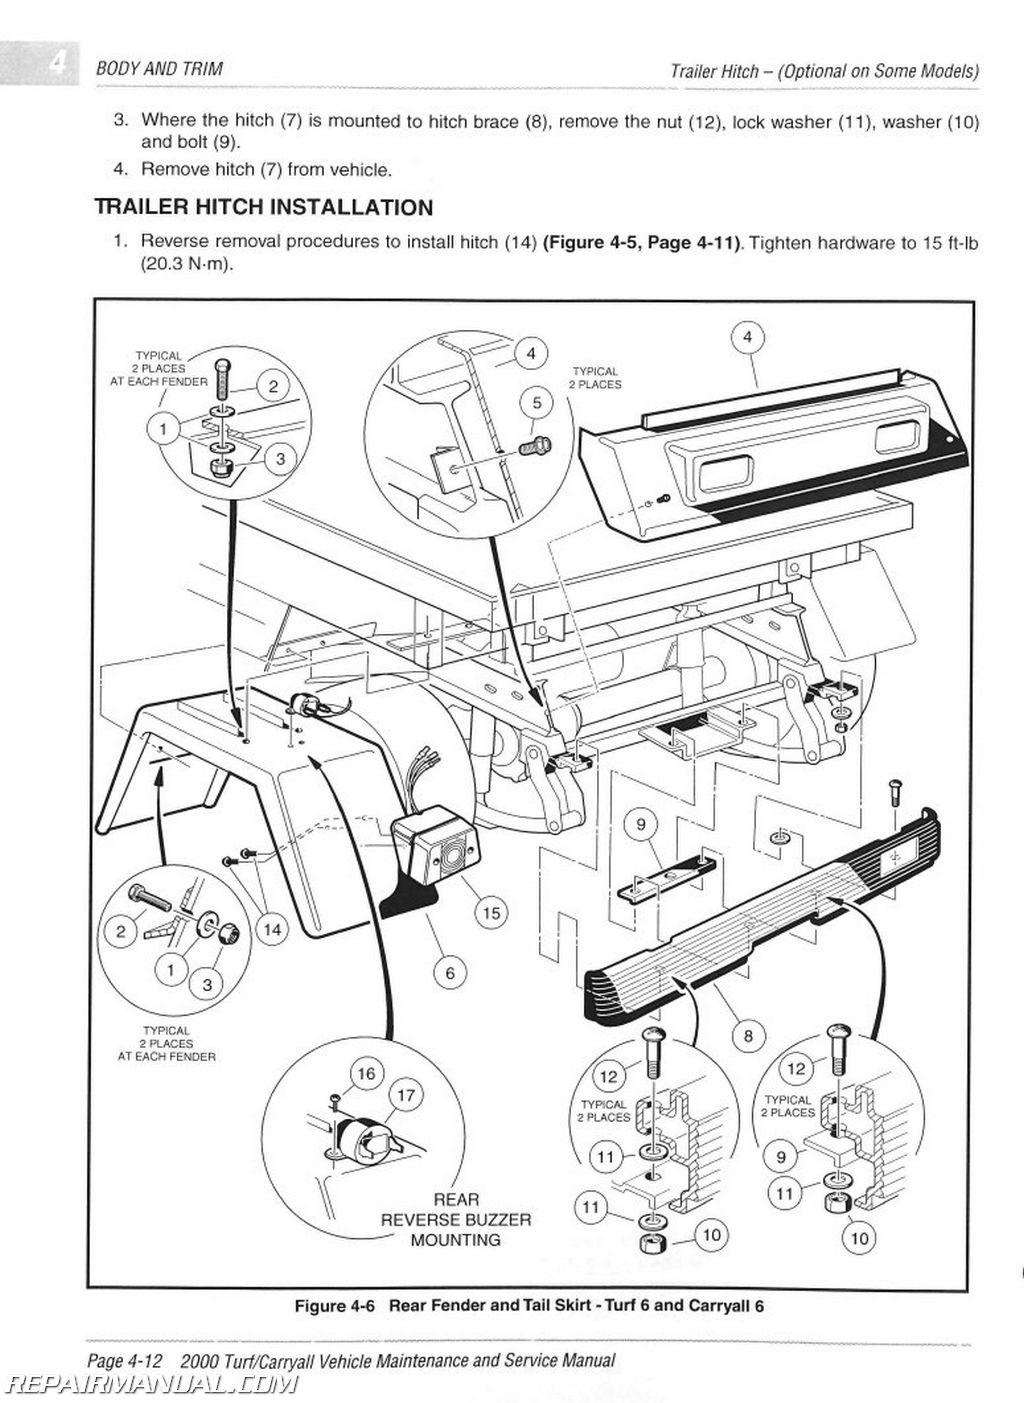 club car turf carry all 2 wiring diagram wiring diagram 1980 Club Car Wiring Diagram club car turf 2 wiring diagram wiring diagram1984 1985 club car ds gasoline vehicle repair manuals